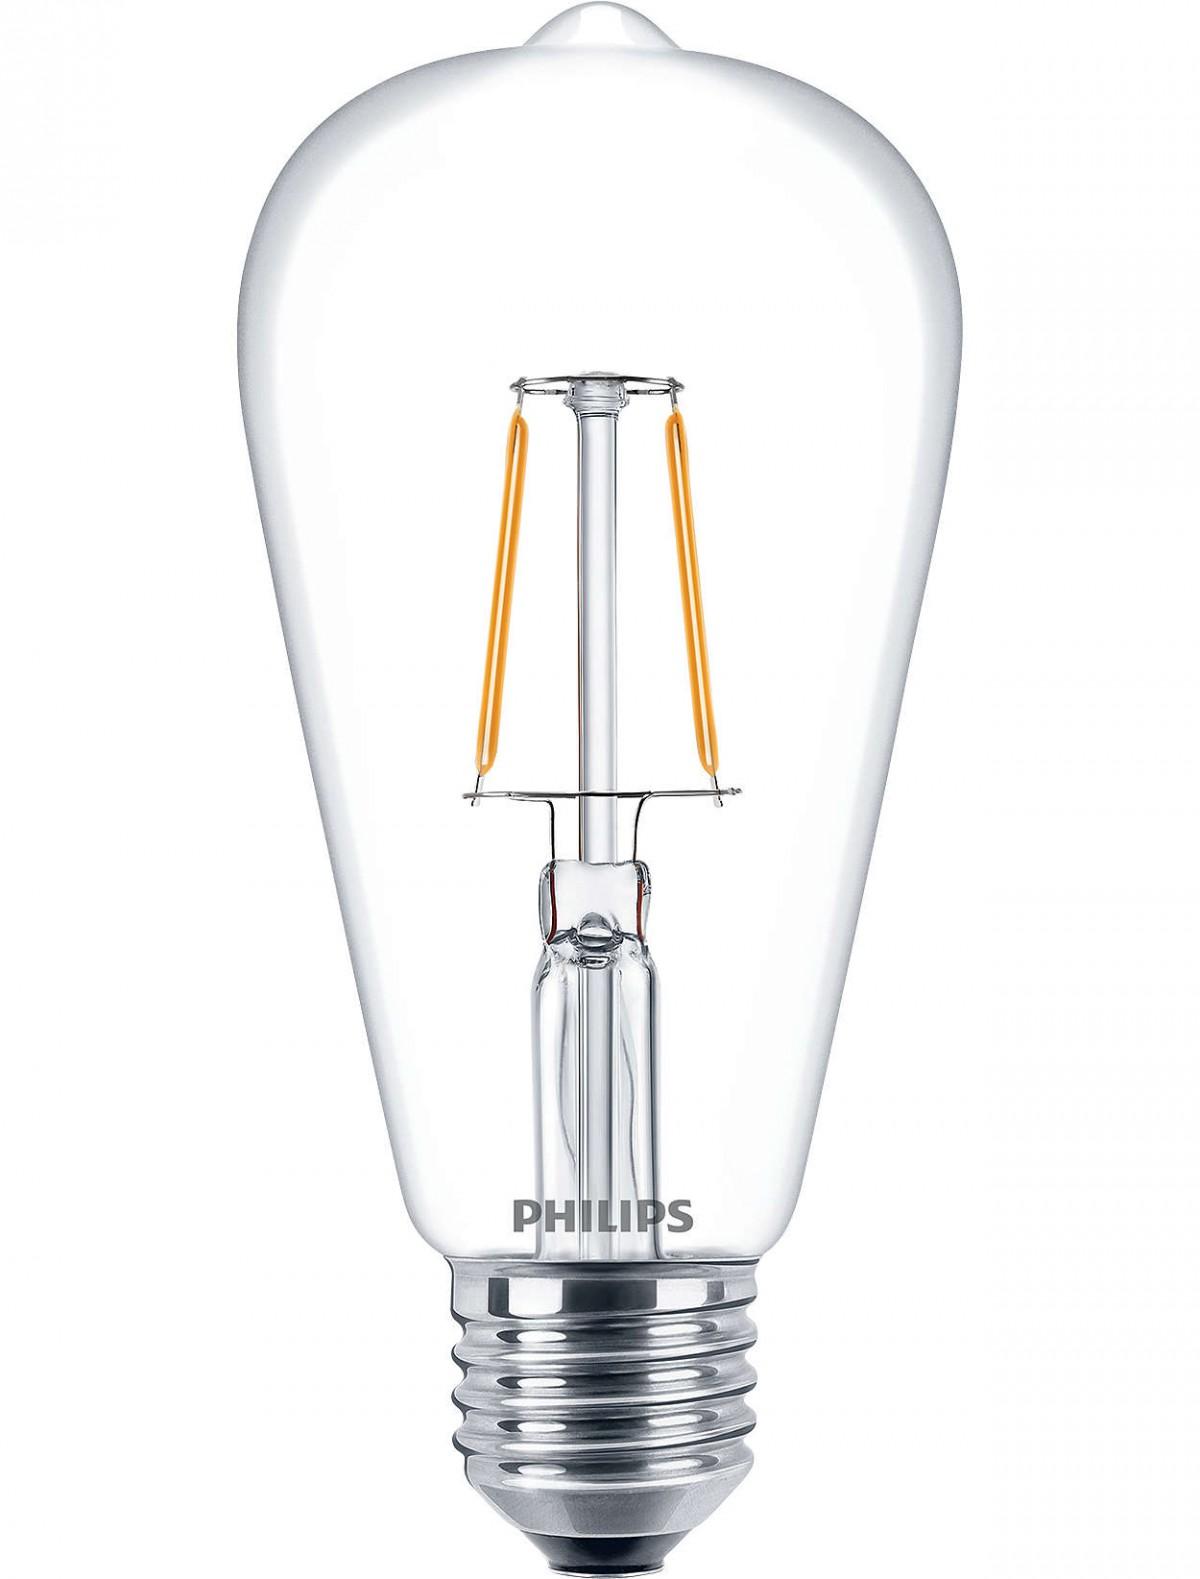 LED žárovka úsporná Philips 7,5W -> ekvivalent 60W E27 - Classic LEDbulb ND 7.5-60W E27 827 ST64 CL